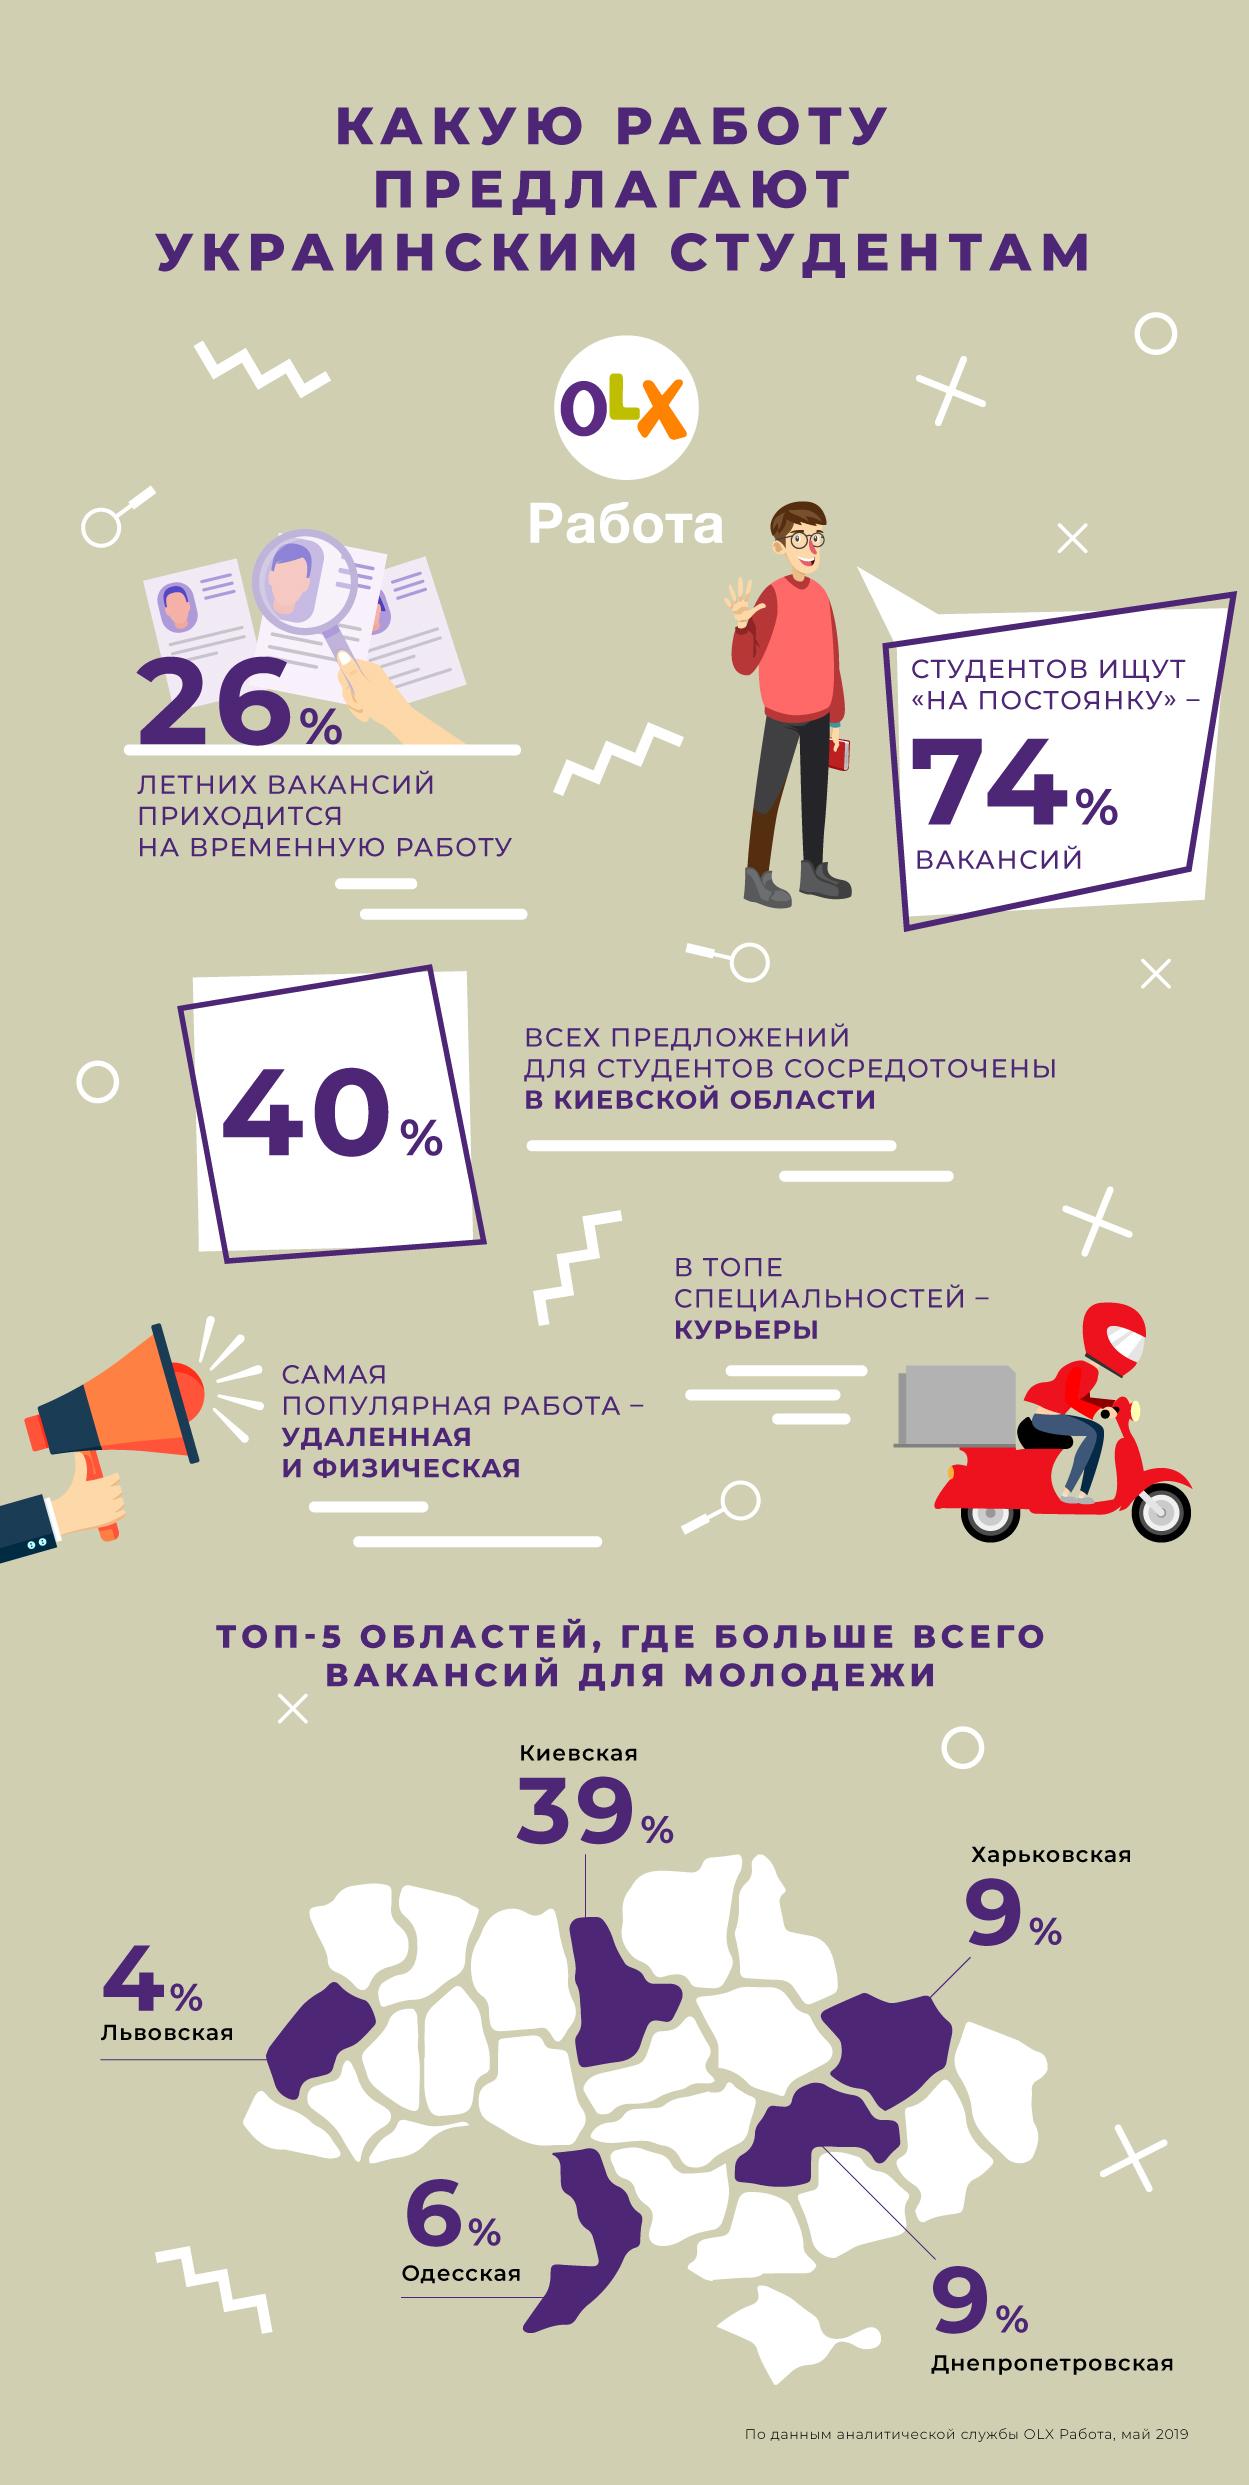 Какую работу предлагают украинским студентам